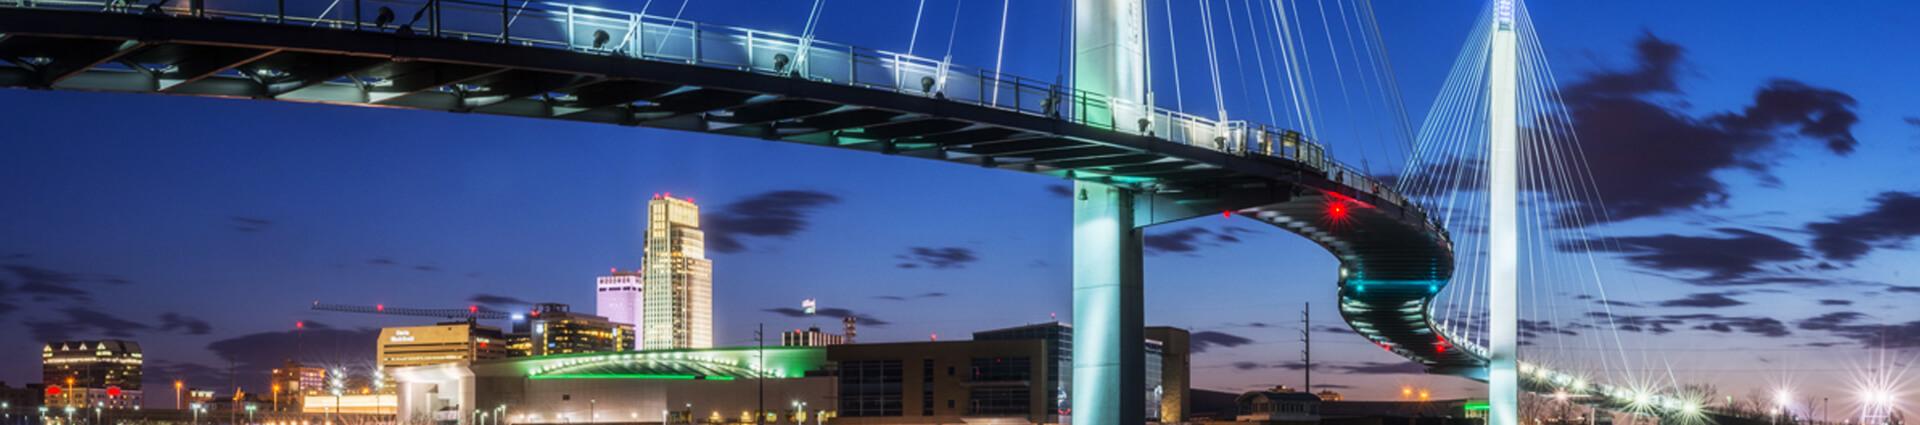 Bobkerry bridge